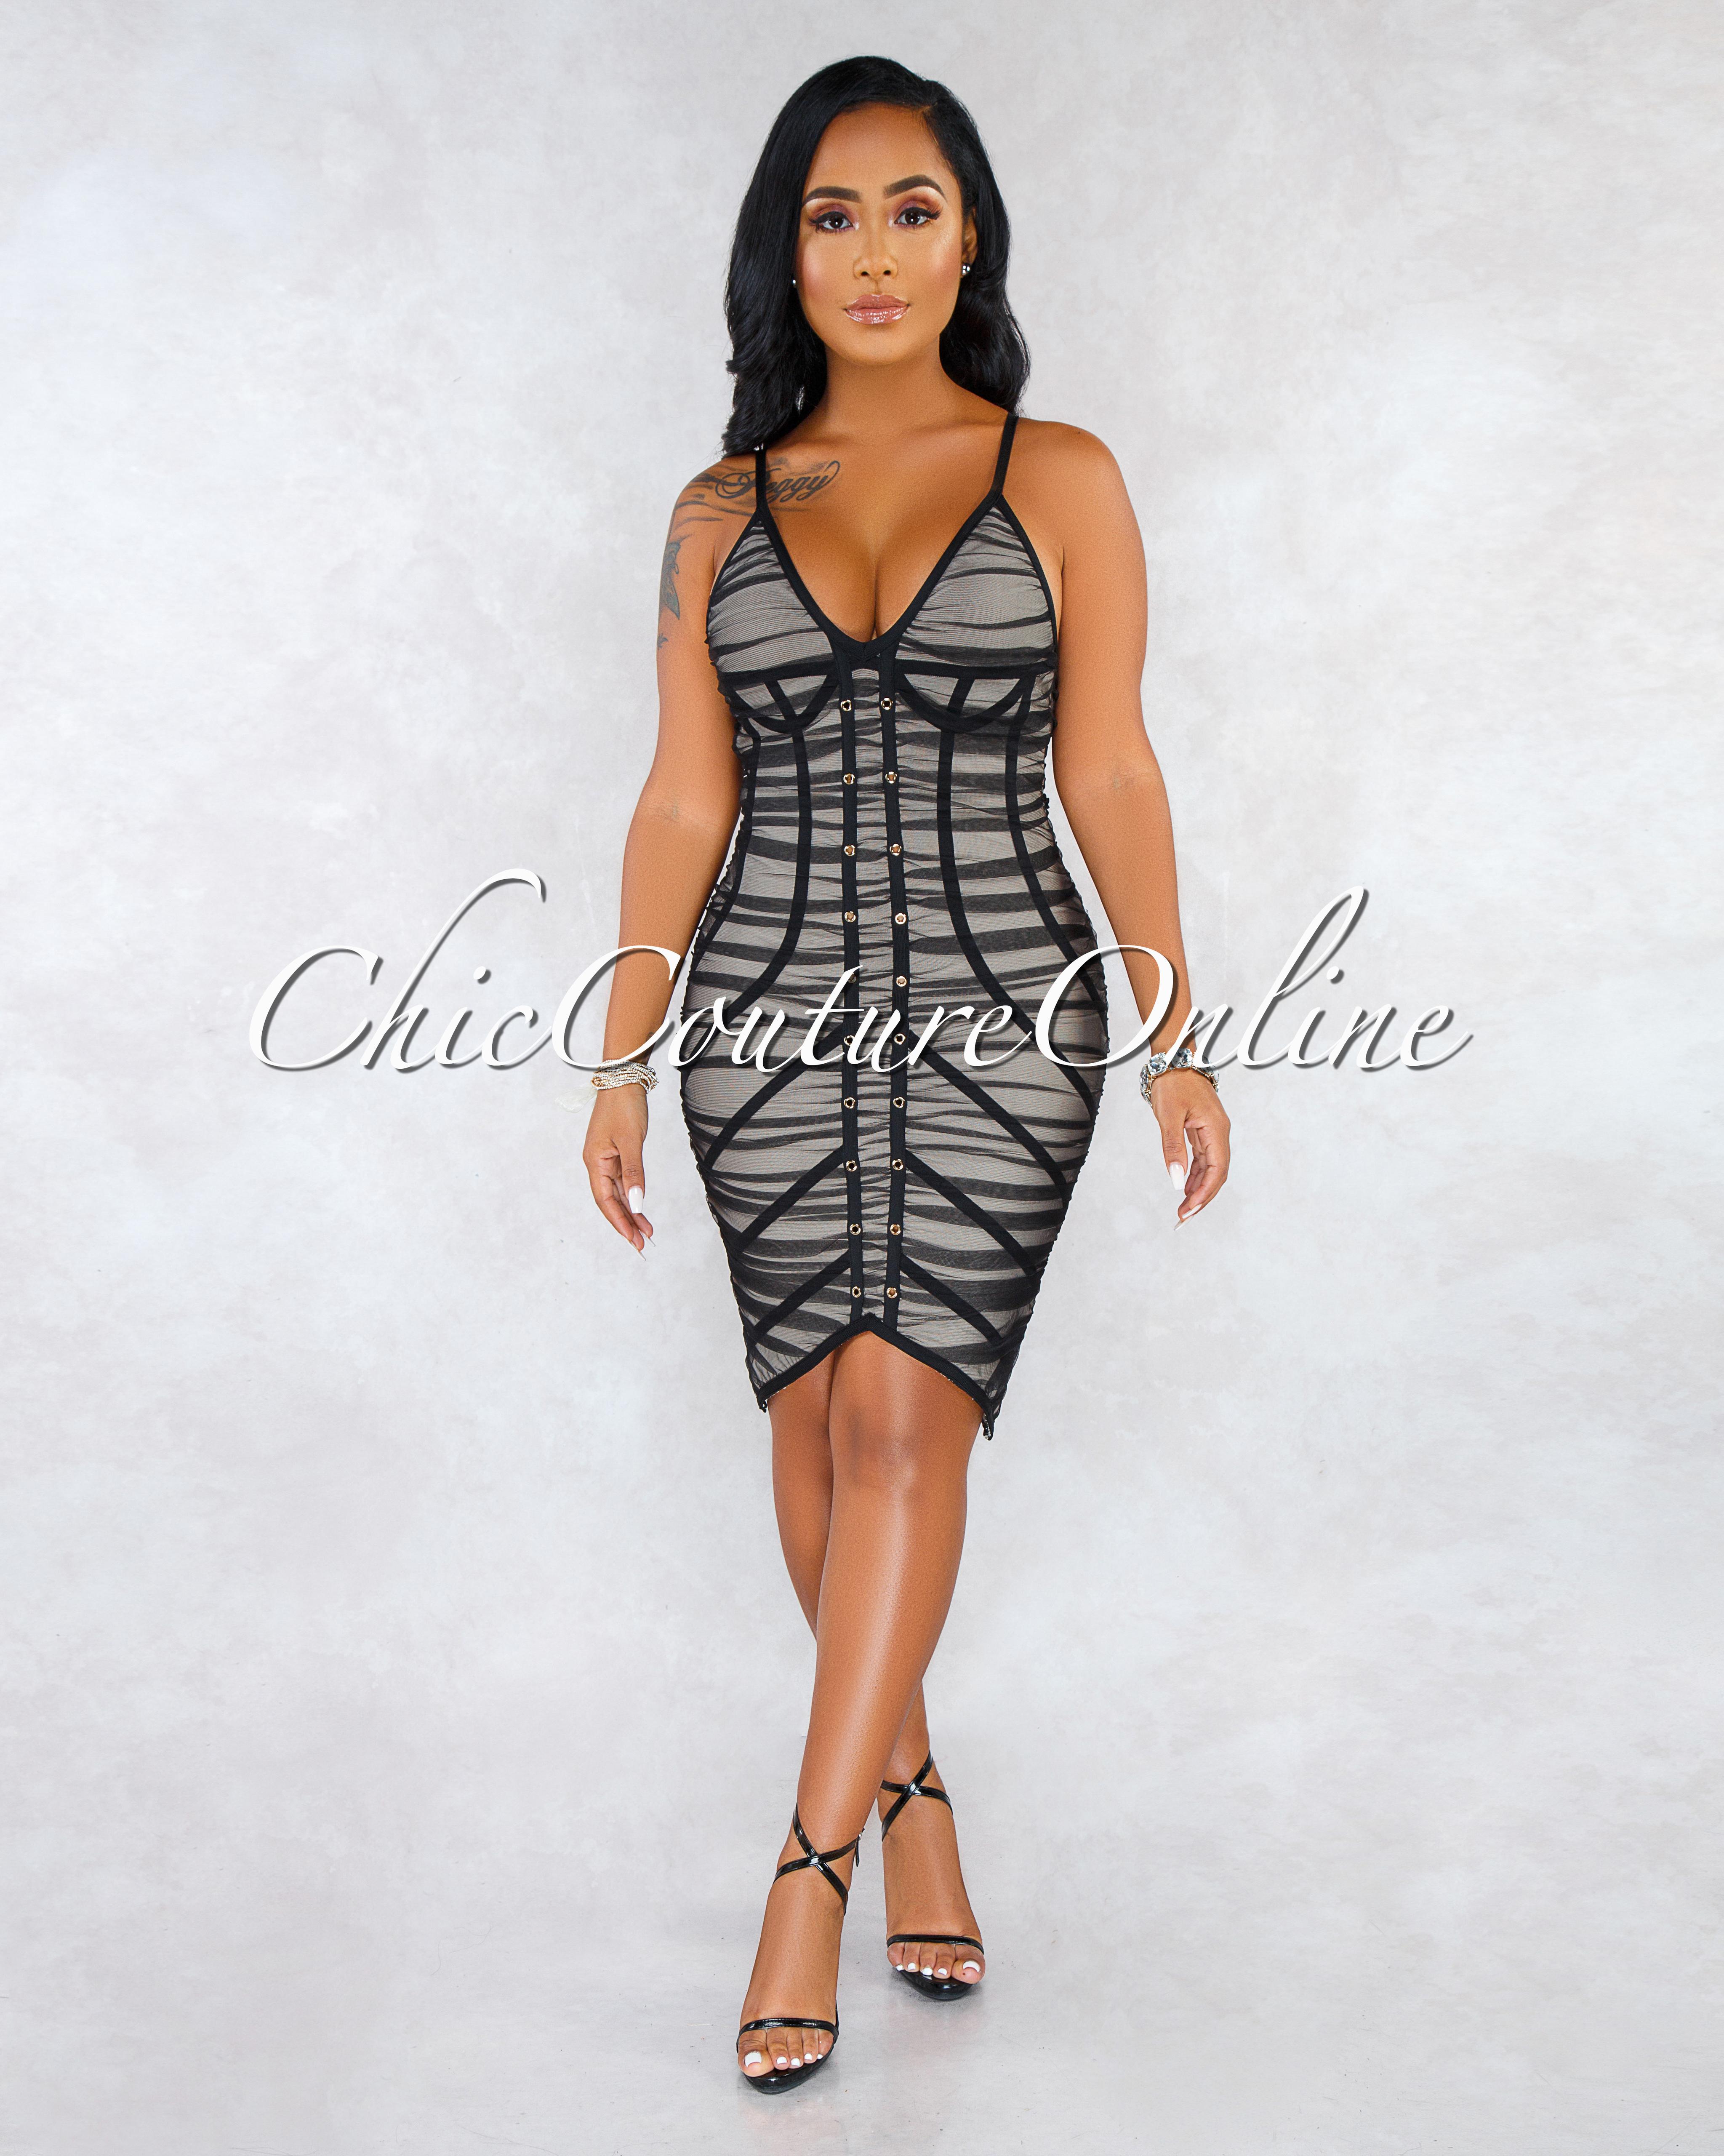 Starry Black Mesh Nude Bandage Dress